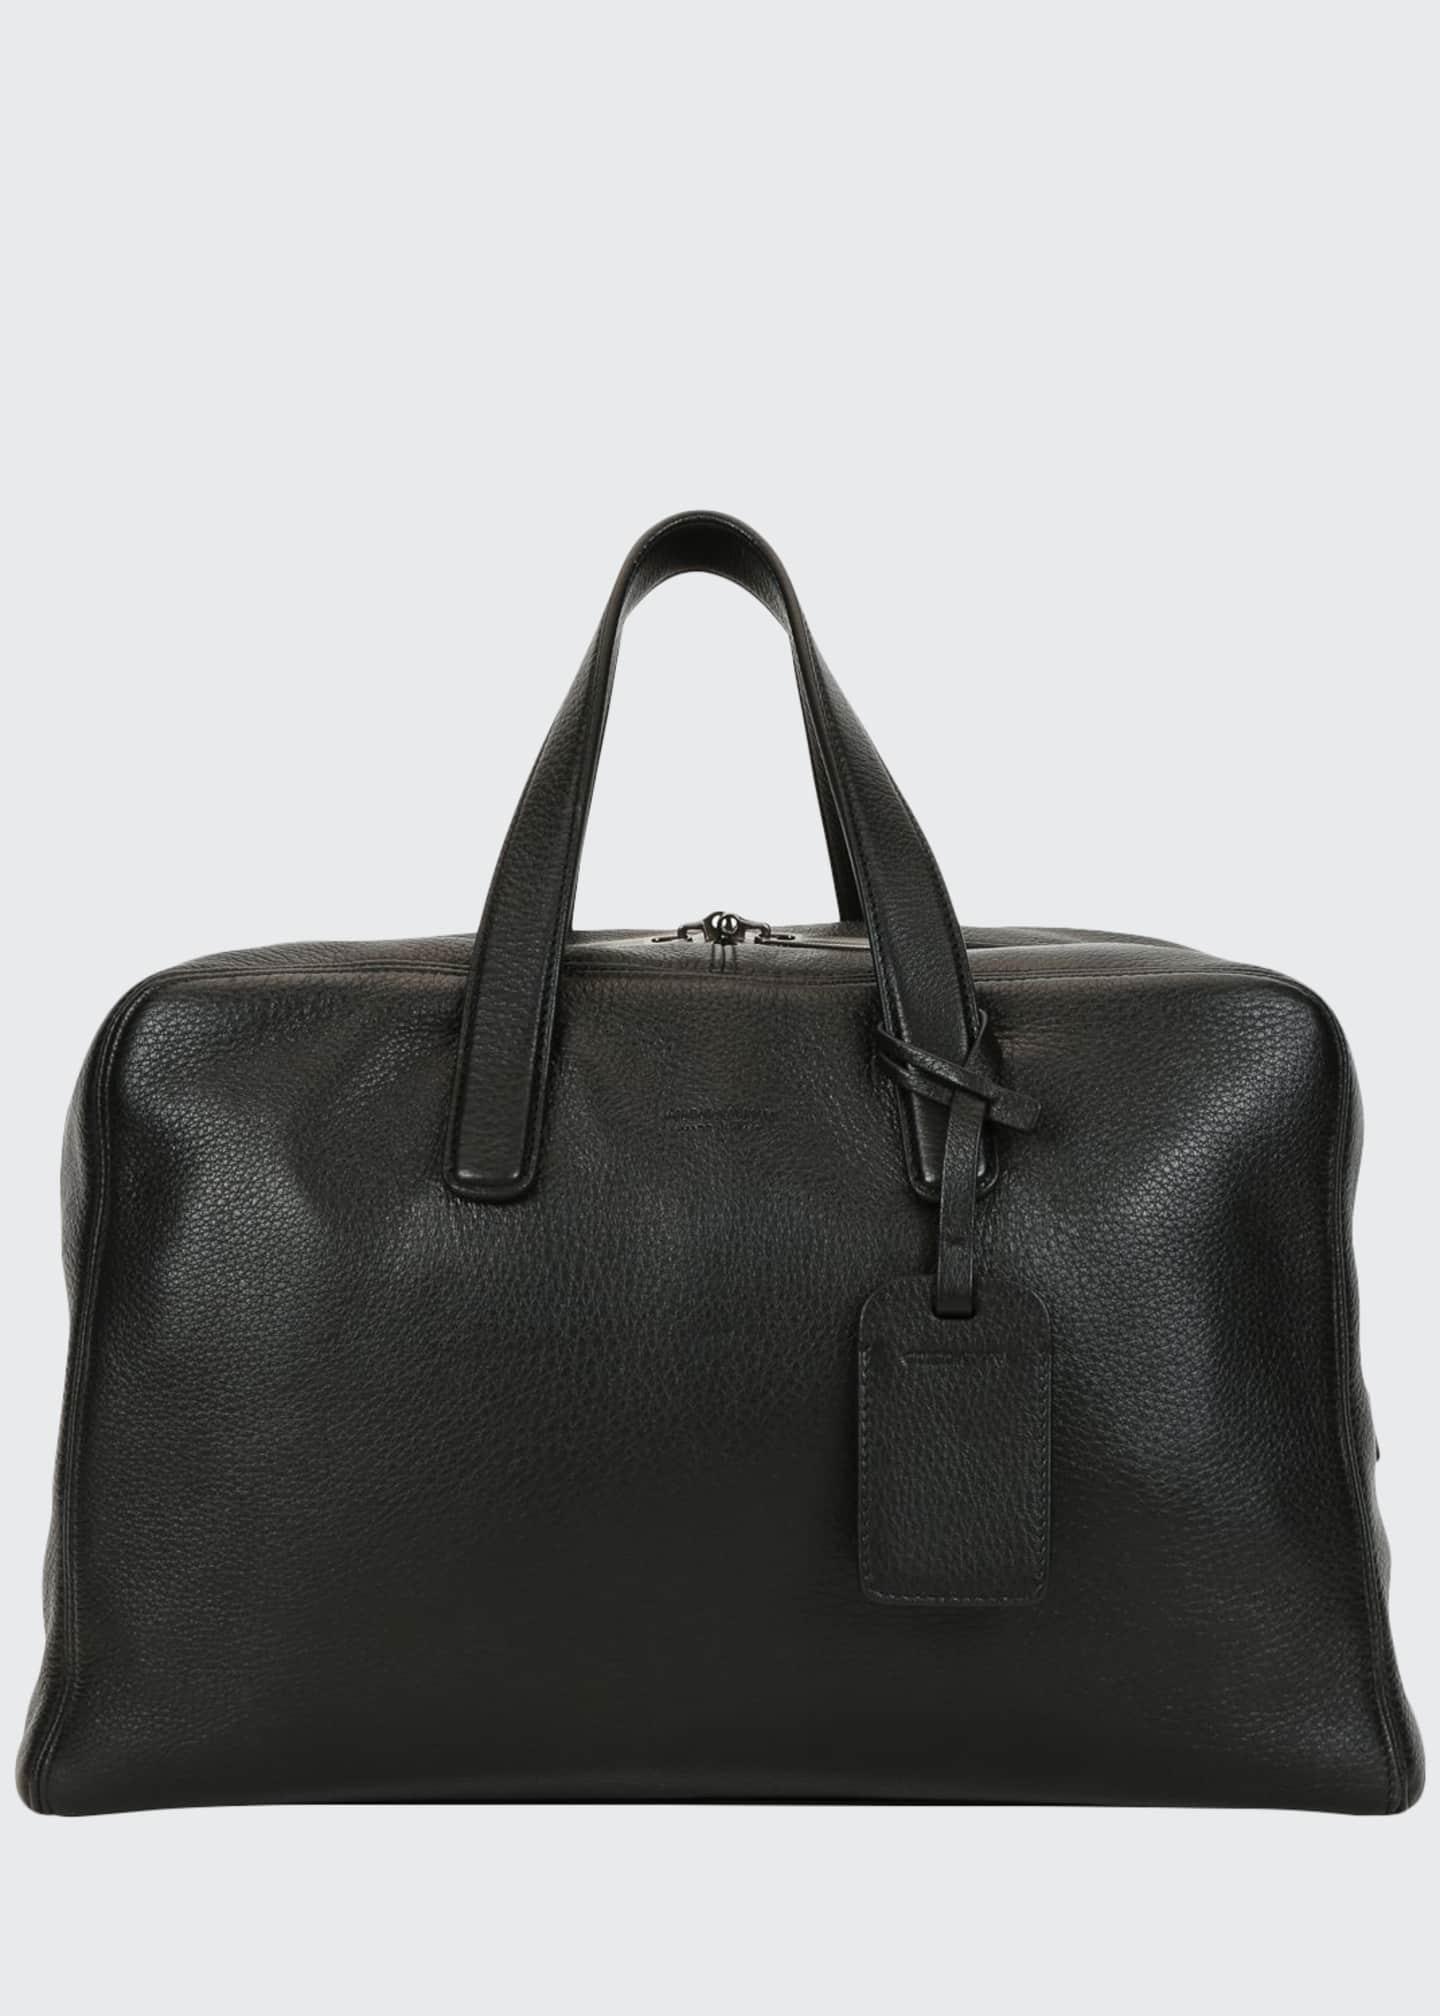 Giorgio Armani Men's Deer Leather Carryall Duffel Bag,